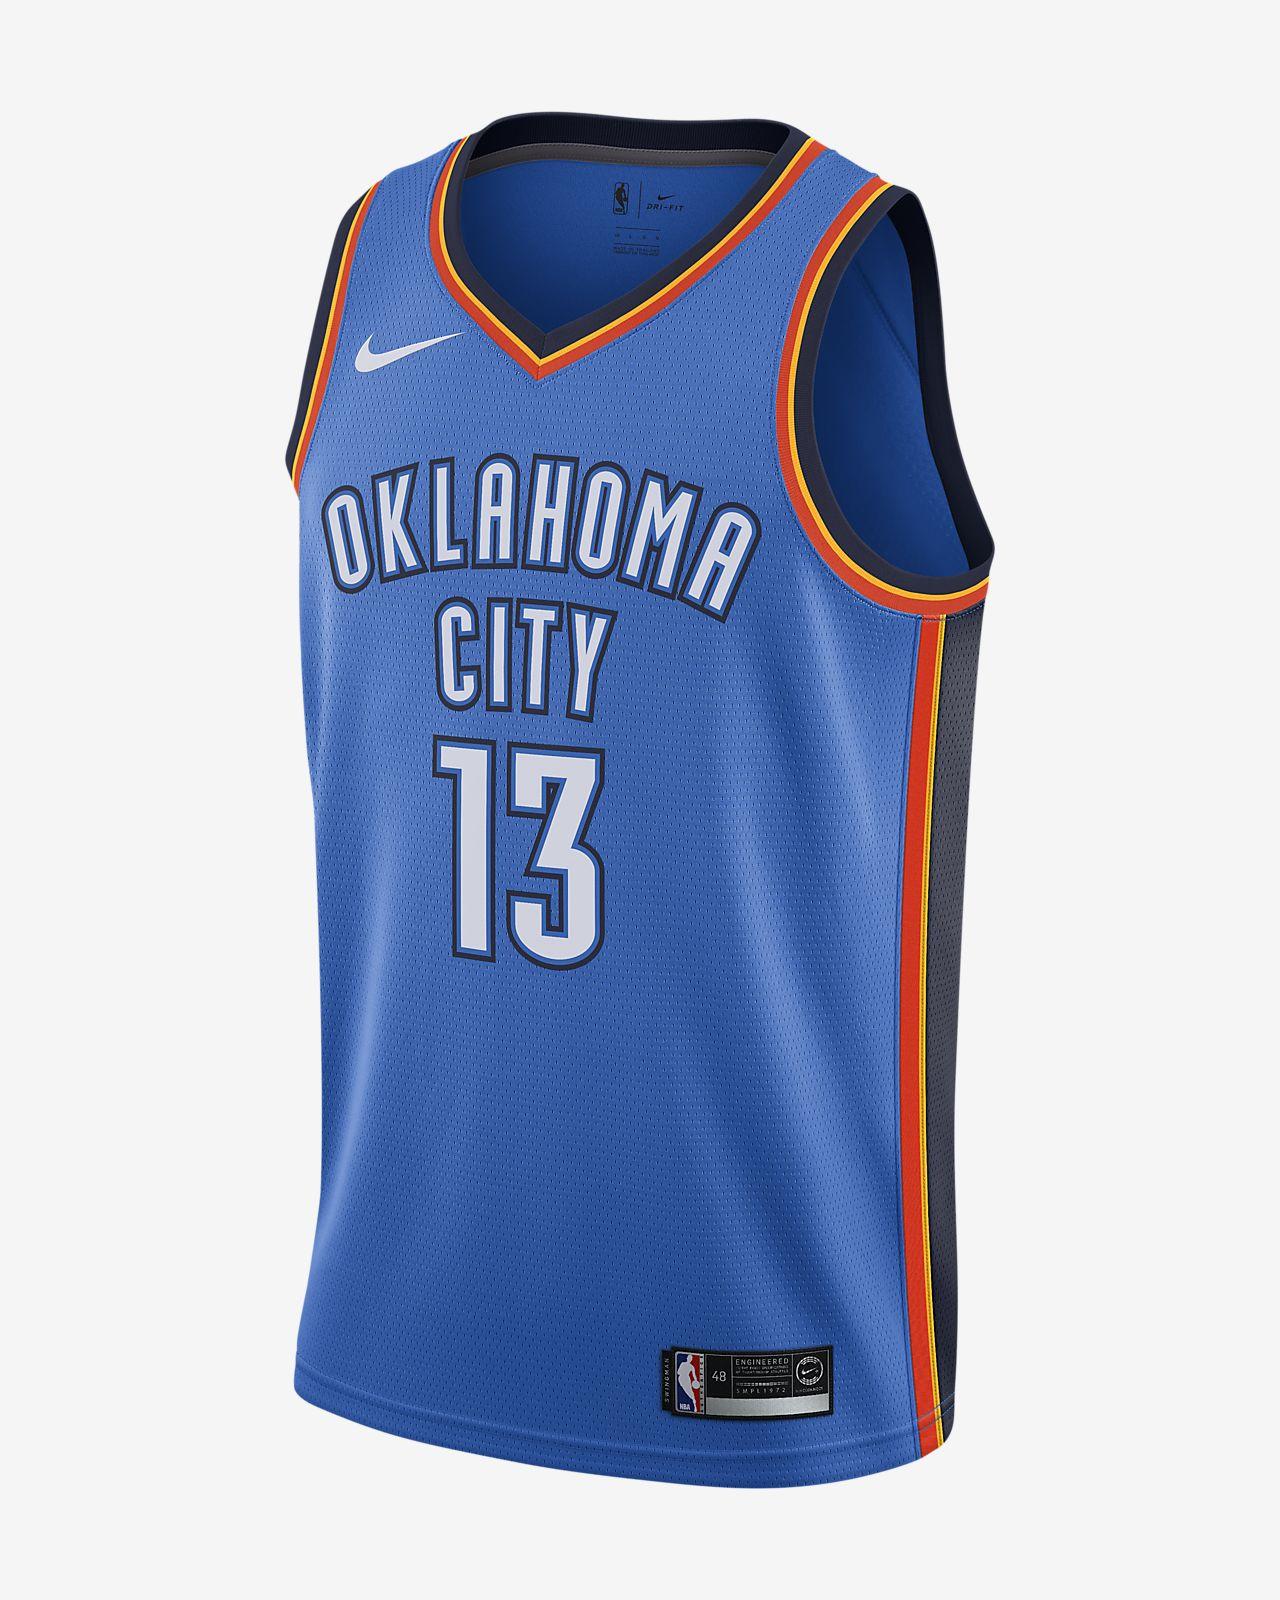 Maillot connecté Nike NBA Paul George Icon Edition Swingman (Oklahoma City Thunder) pour Homme